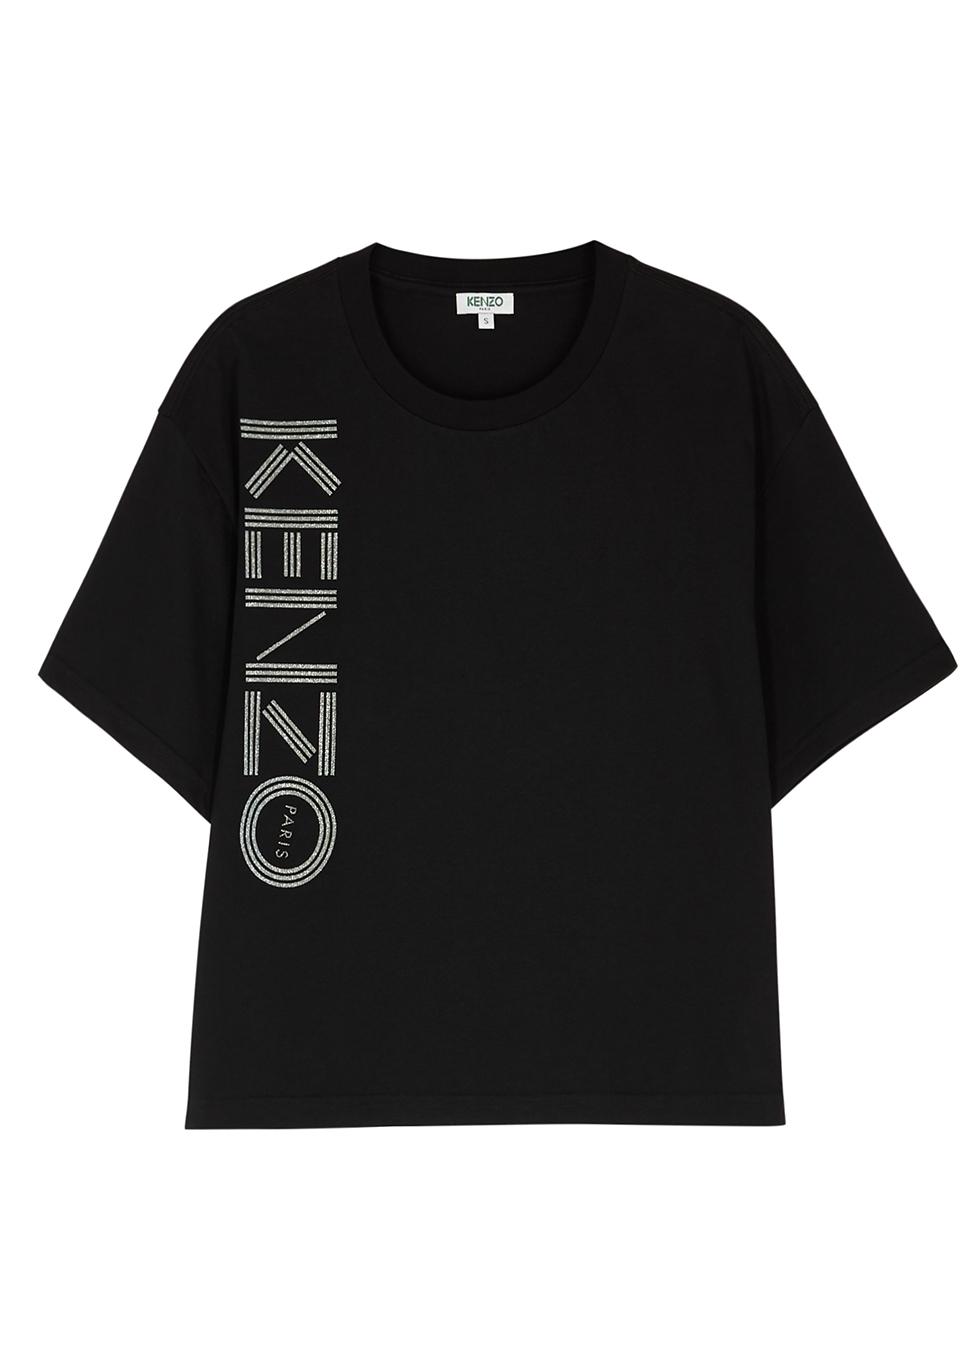 89715b77781 Kenzo - Designer Sweatshirts, T-Shirts, Bags - Harvey Nichols